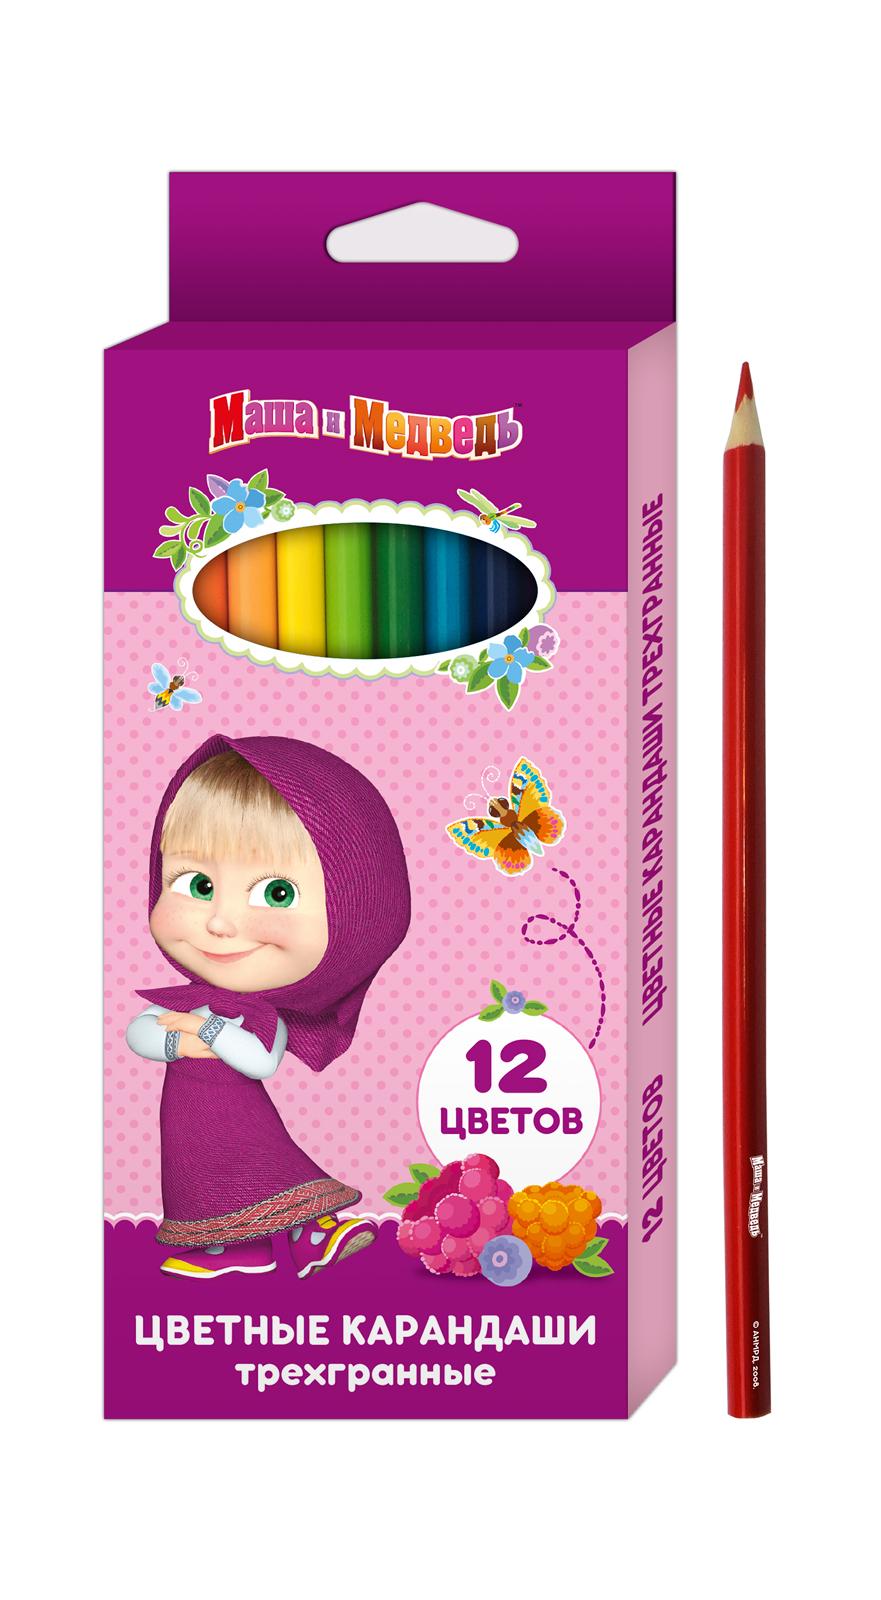 Ручки и карандаши Маша и Медведь Цветные карандаши Маша и Медведь трехгранные 12 цв. цена